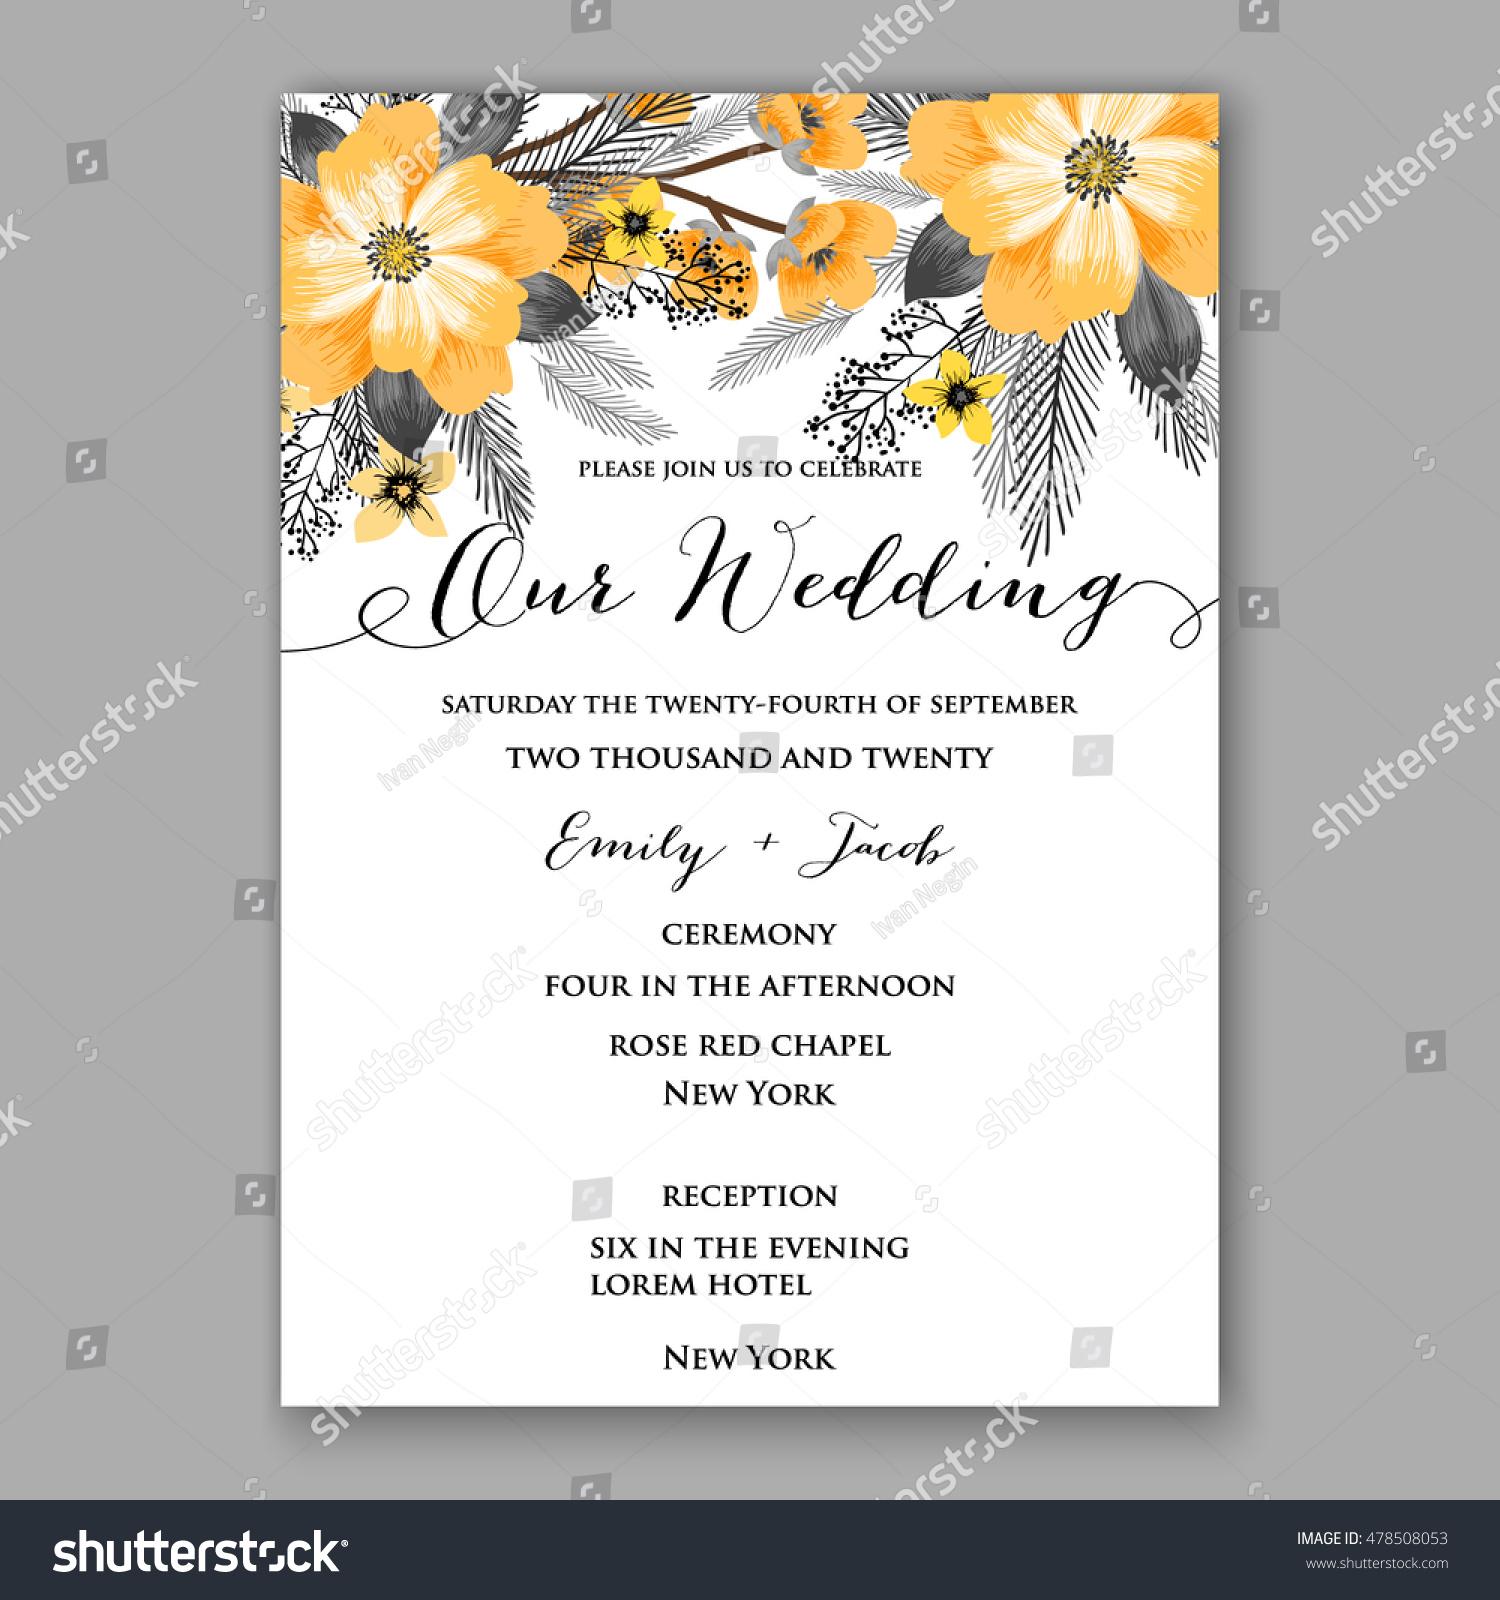 poinsettia wedding invitation sample card beautiful stock vector poinsettia wedding invitation sample card beautiful winter floral or nt christmas party wreath poinsettia pine branch